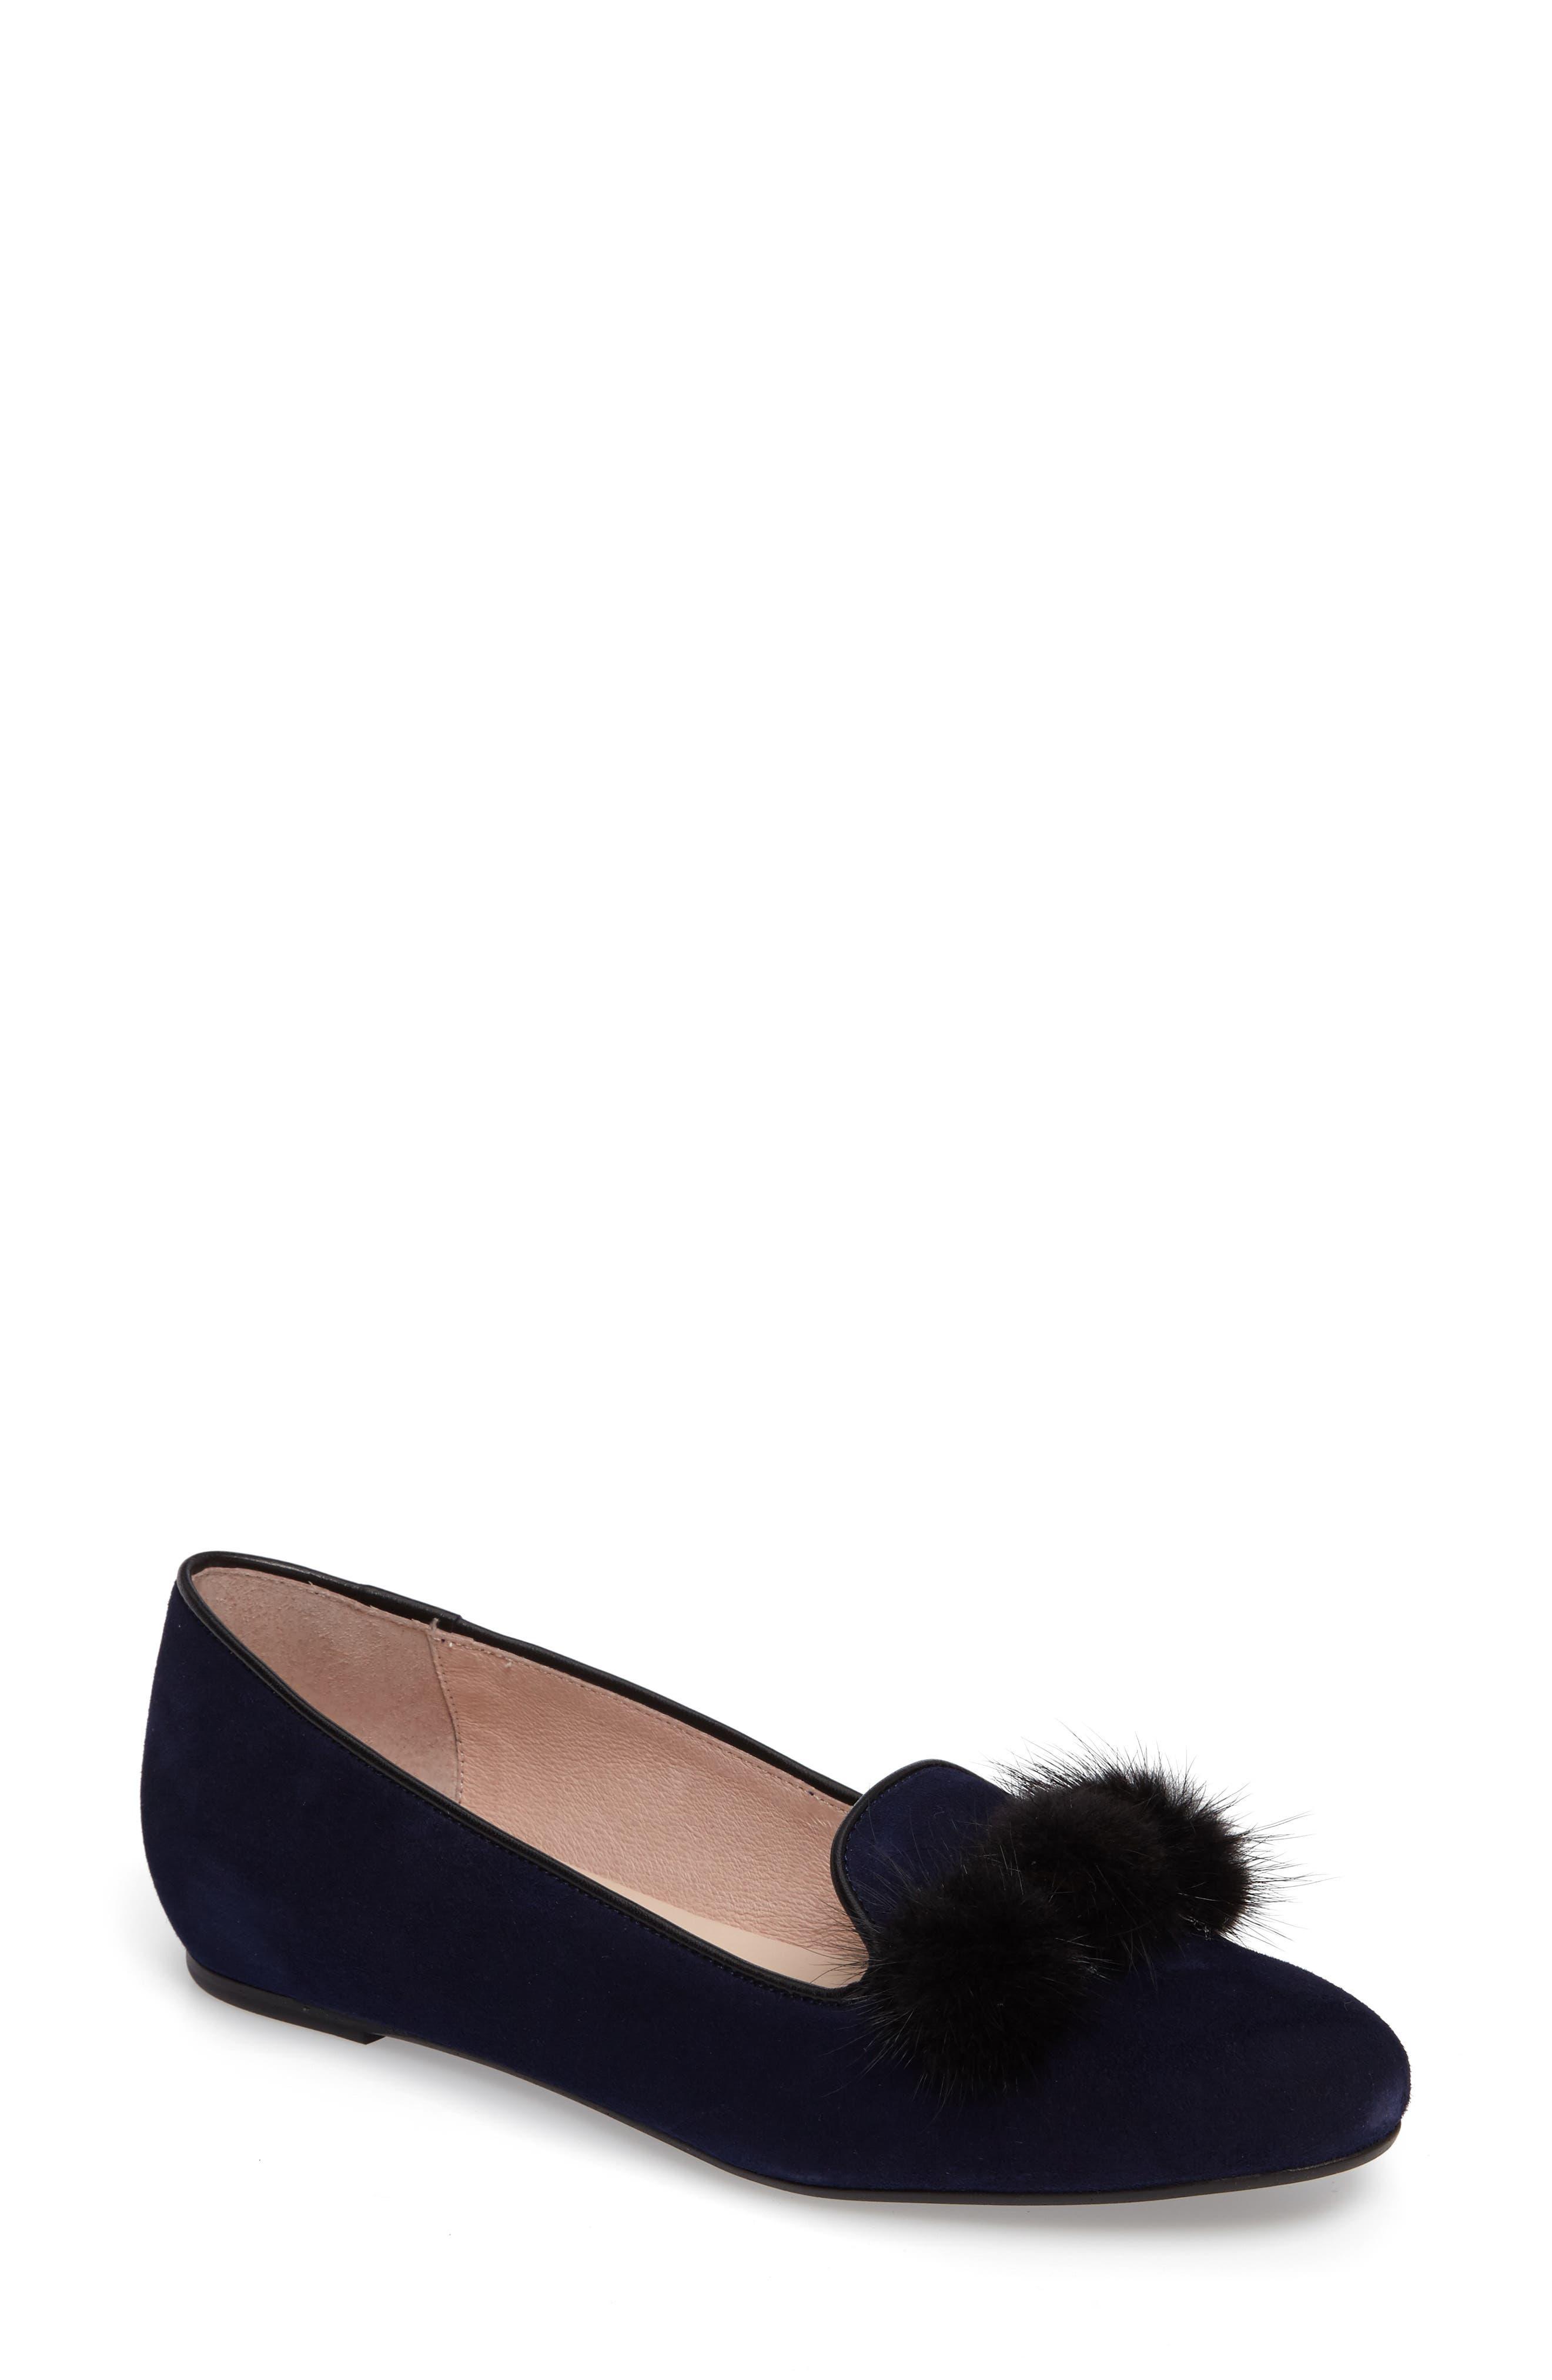 Wallis Genuine Fur Pompom Loafer,                             Main thumbnail 1, color,                             Navy Suede